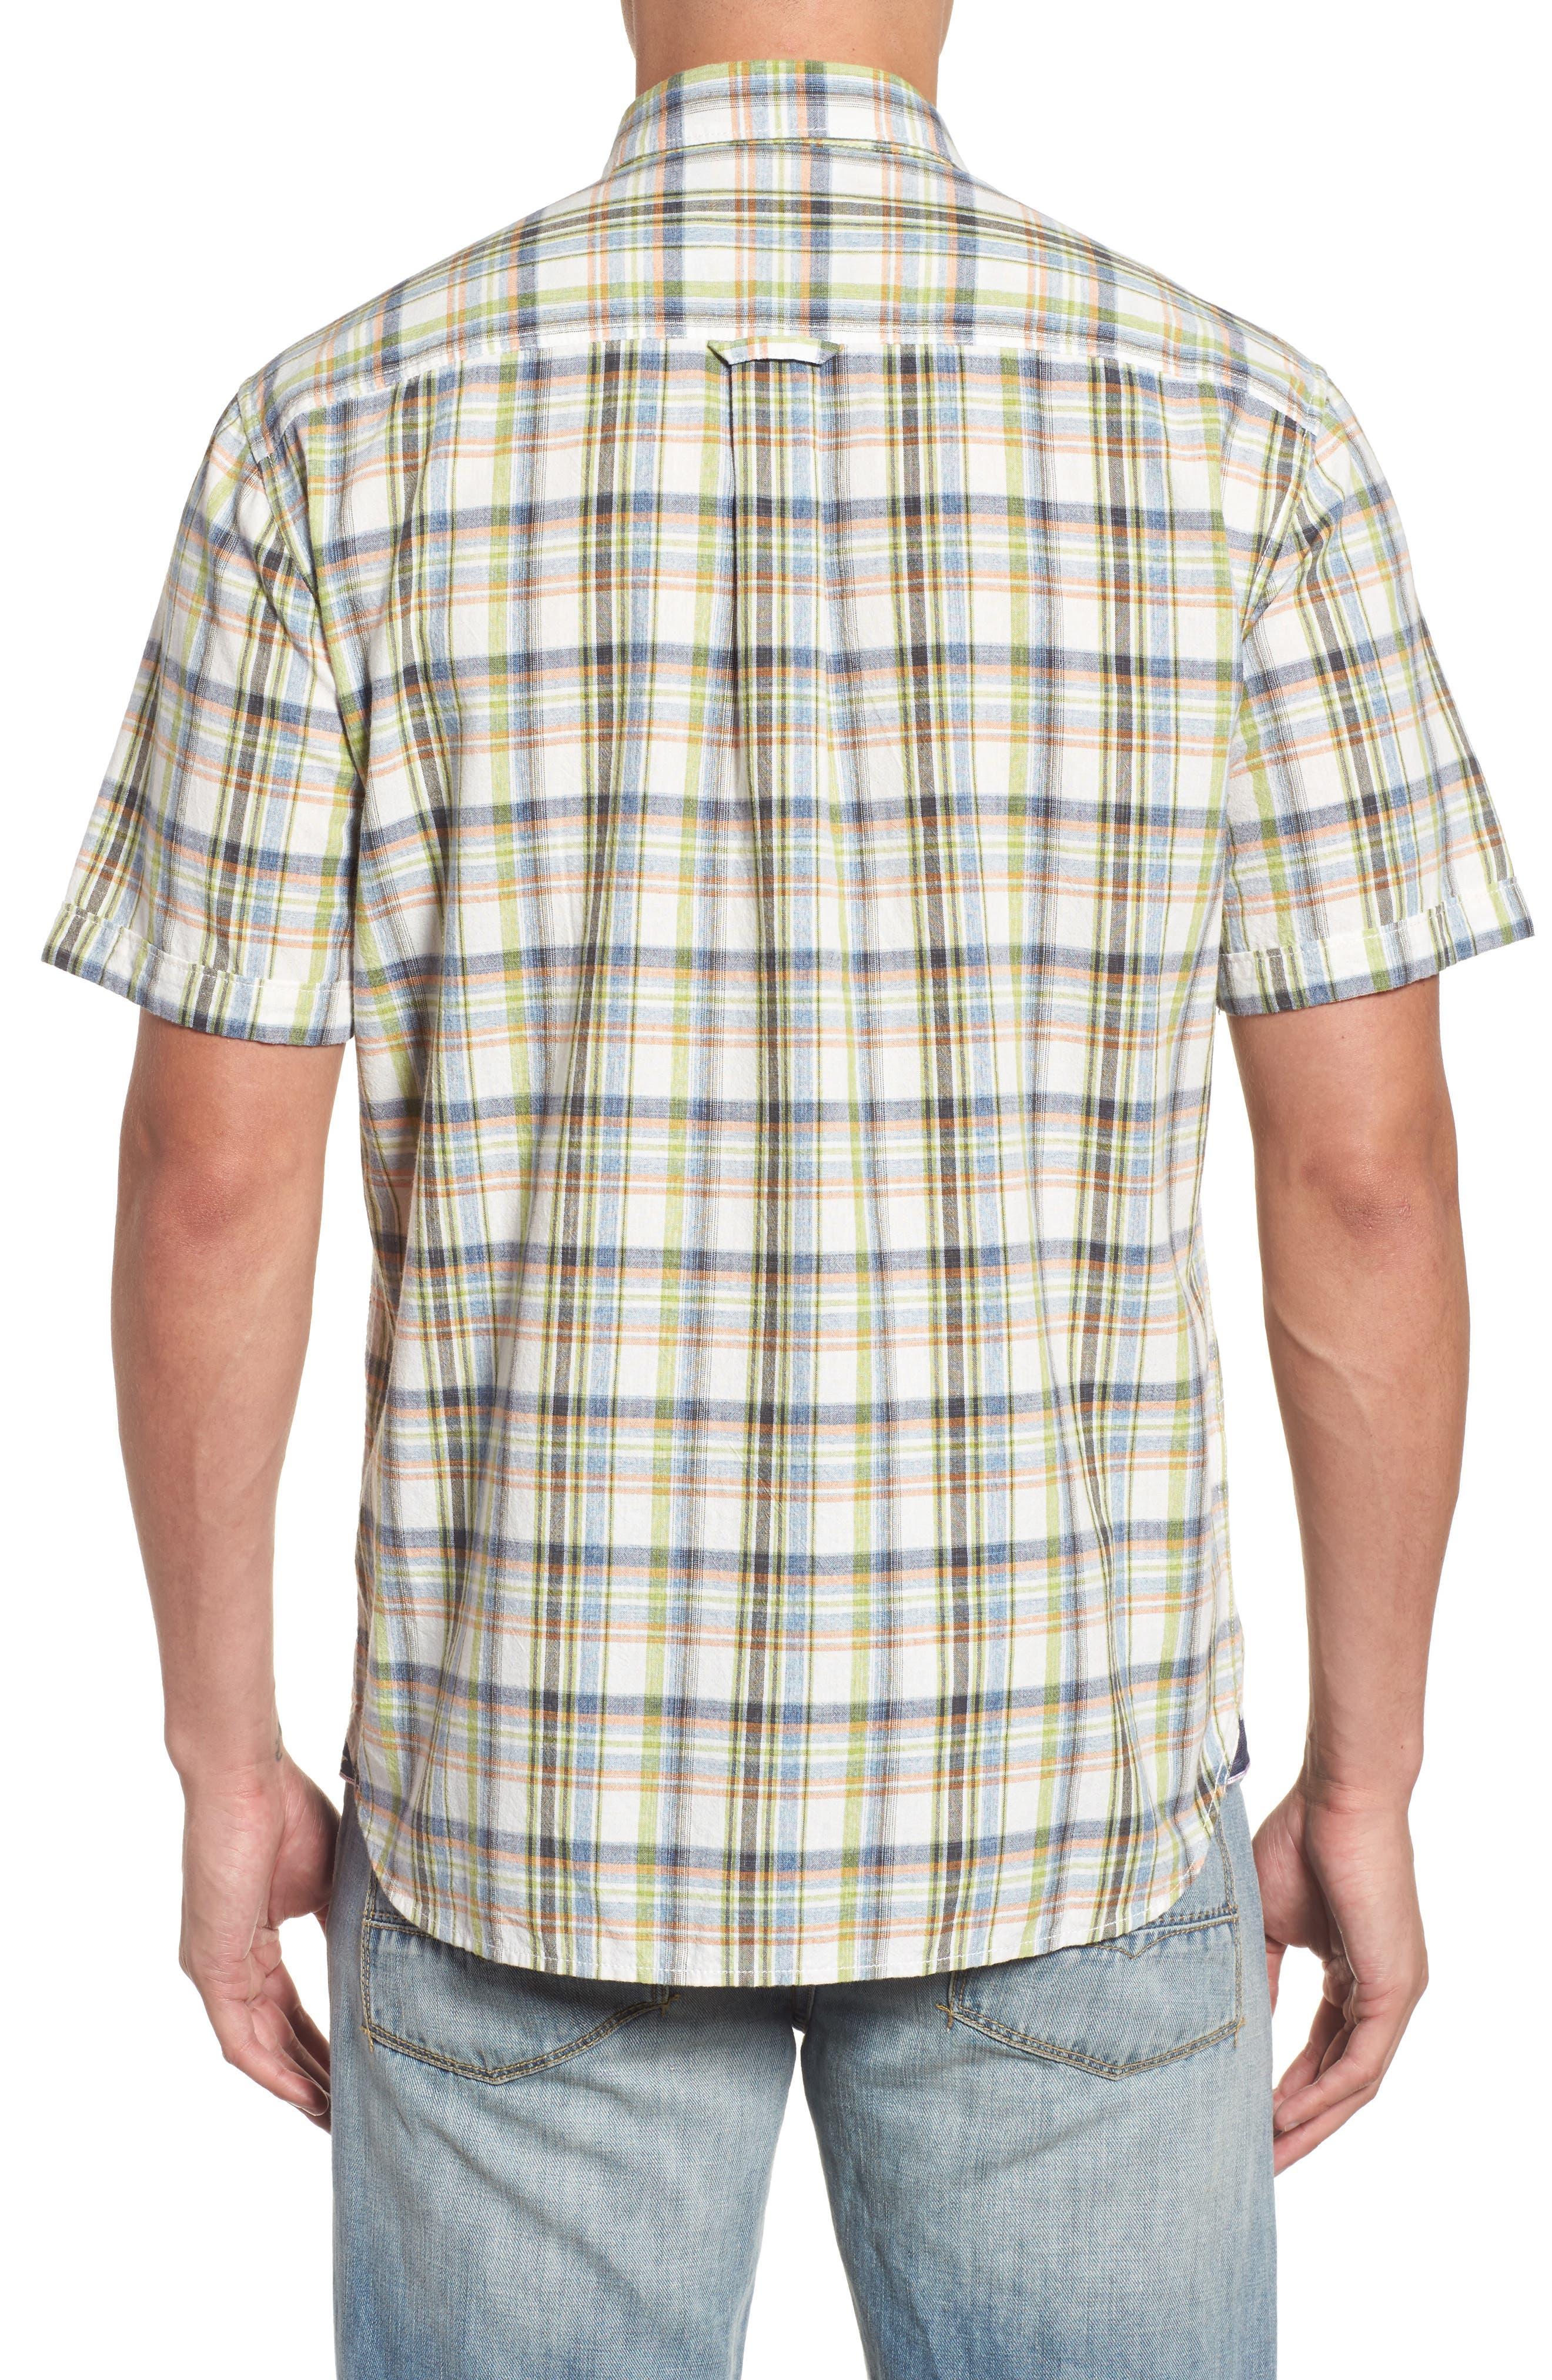 Ocean Cay Plaid Sport Shirt,                             Alternate thumbnail 2, color,                             Tart Apple